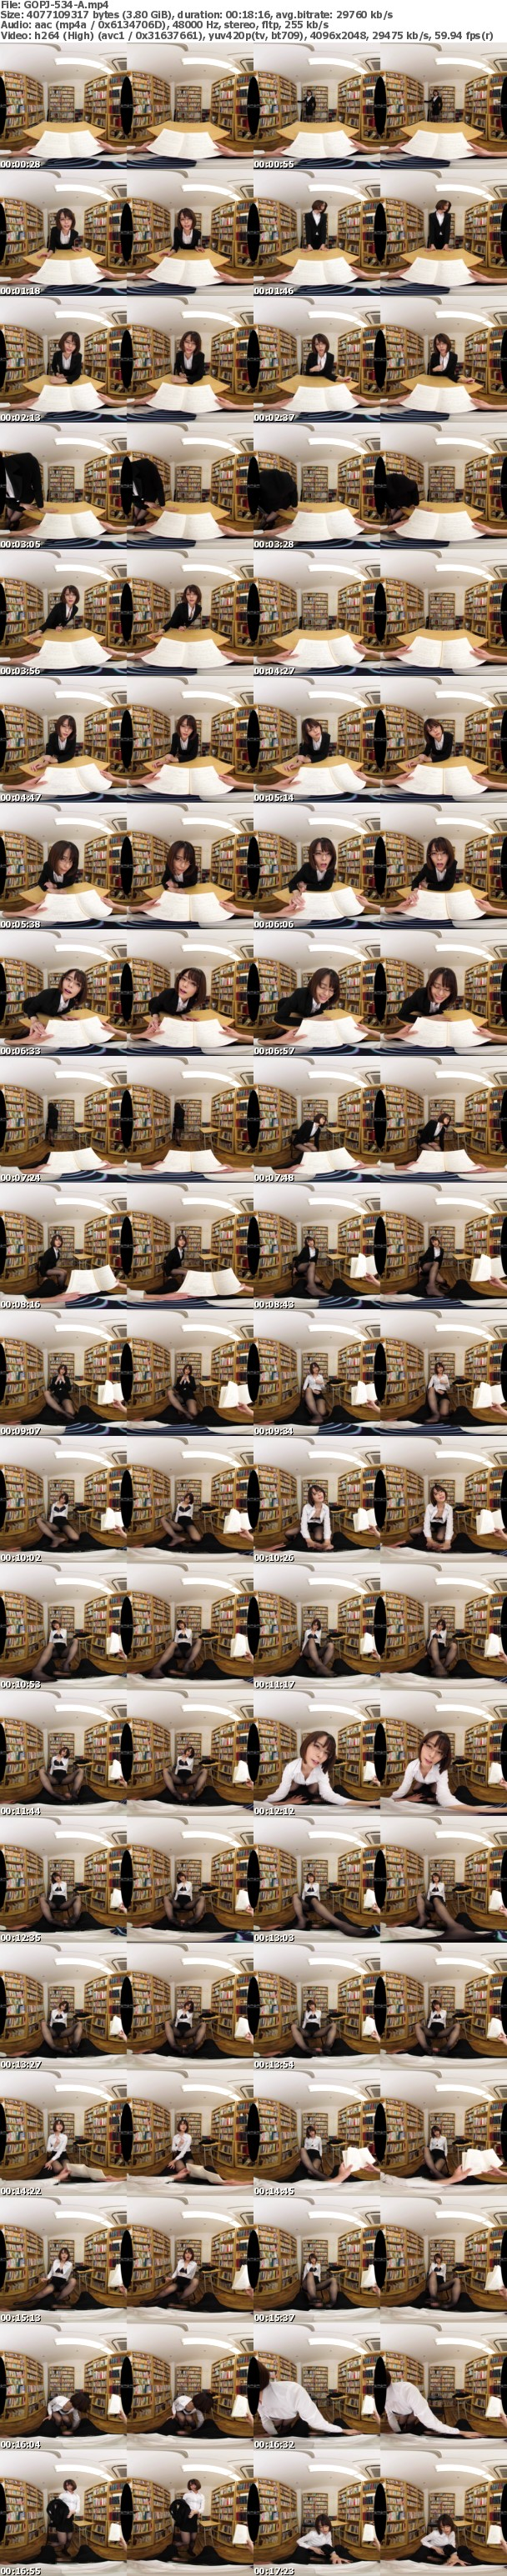 (VR) GOPJ-534 HQ 劇的超高画質 色気ムンムン痴女先生 静かな図書室で囁き淫語責め&バレないように声我慢SEX